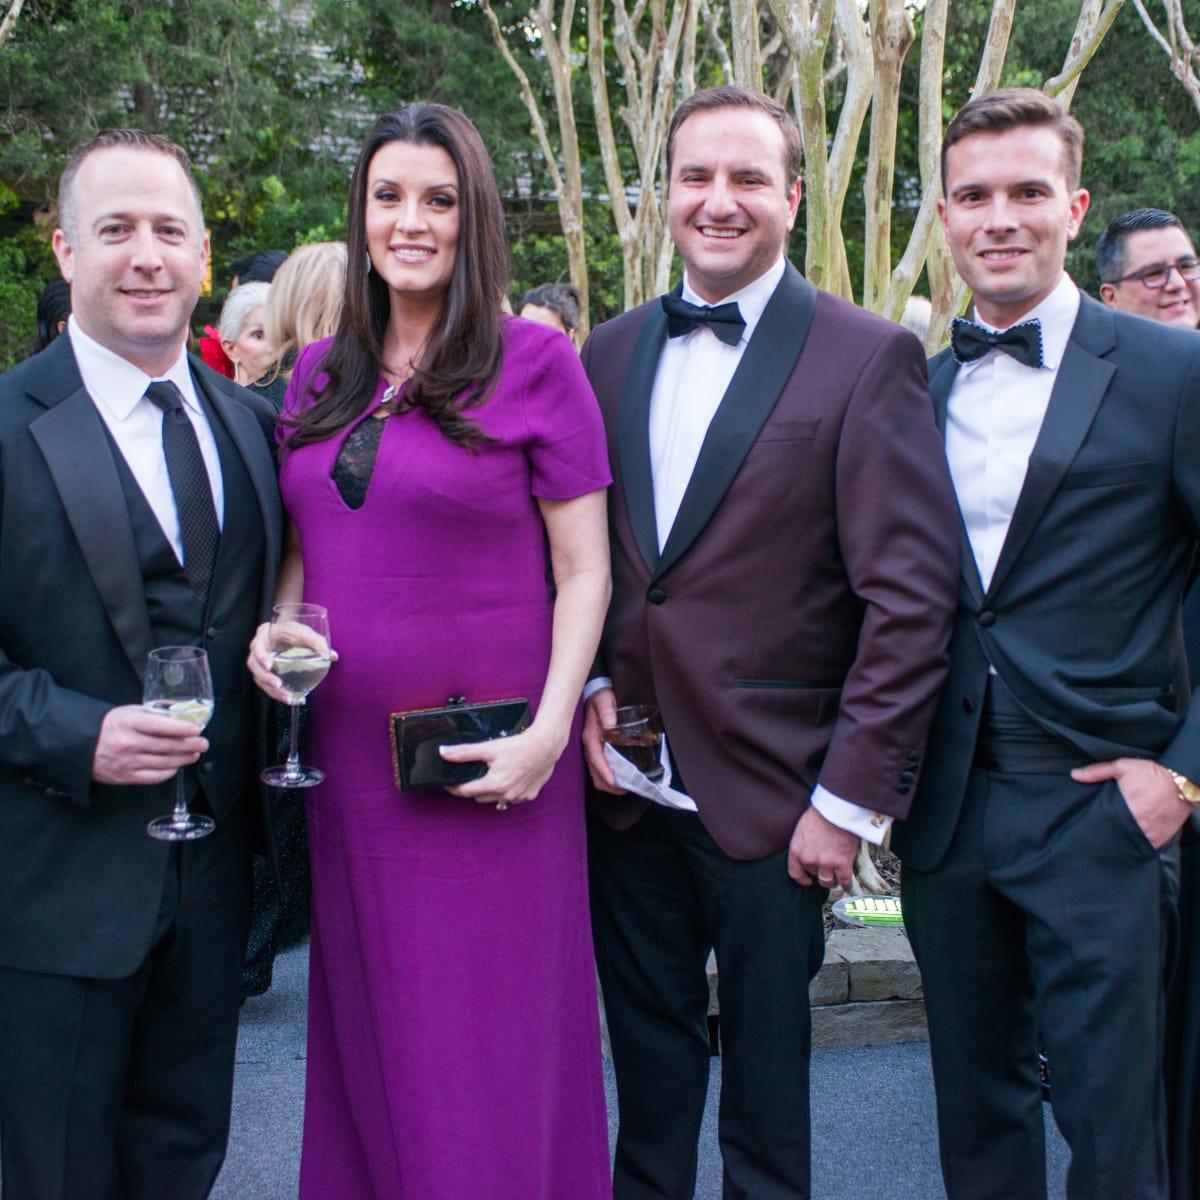 Van Cleef & Arpels party, April 2016, Dylan Seff, Jordan Seff, Tony Gibson, J.D. Adamson